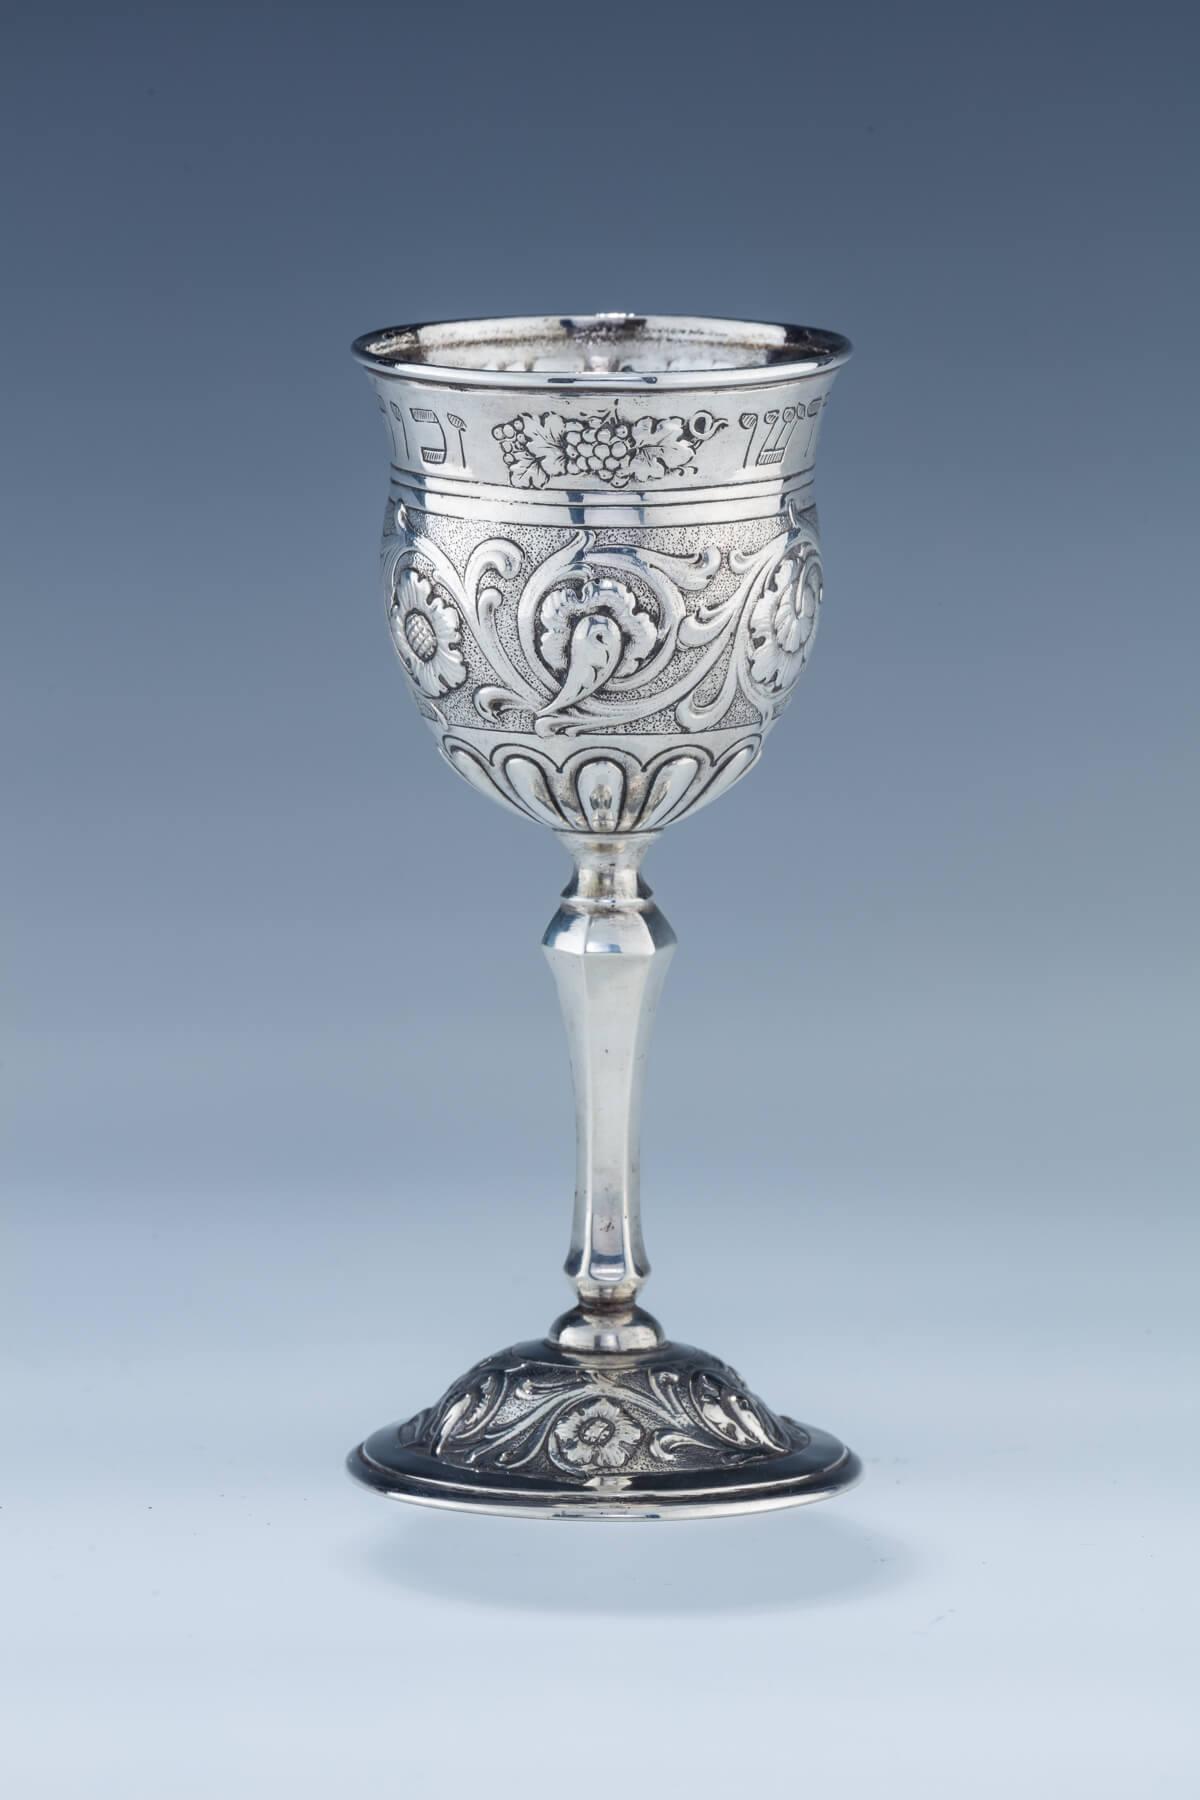 31. A Silver Kiddush Goblet